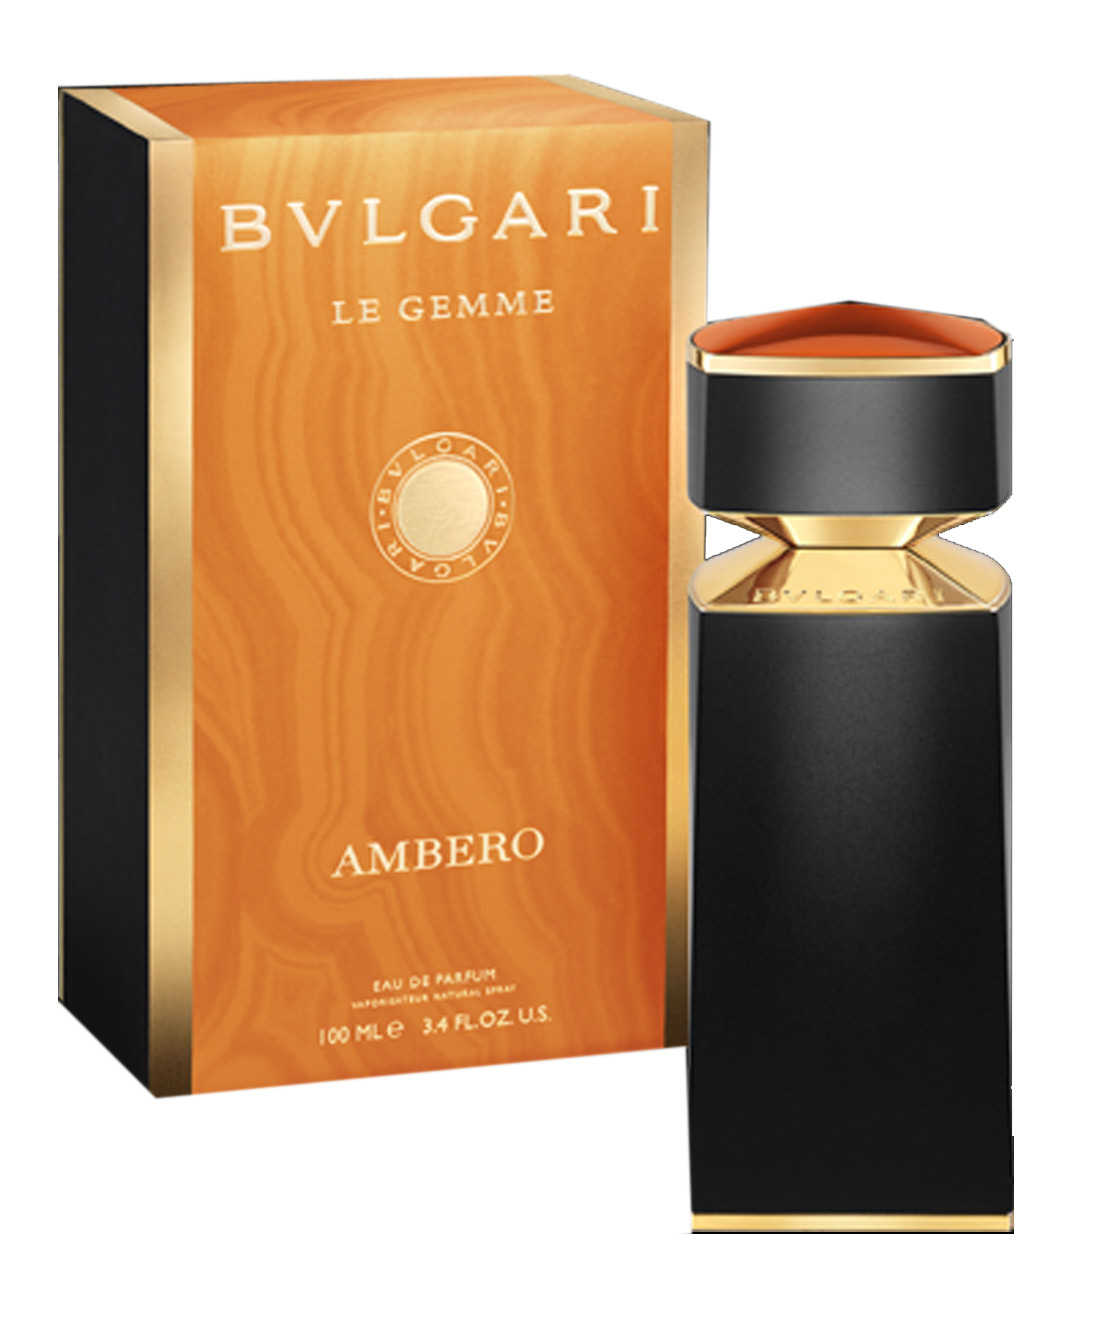 Ambero Bvlgari одеколон аромат для мужчин 2016